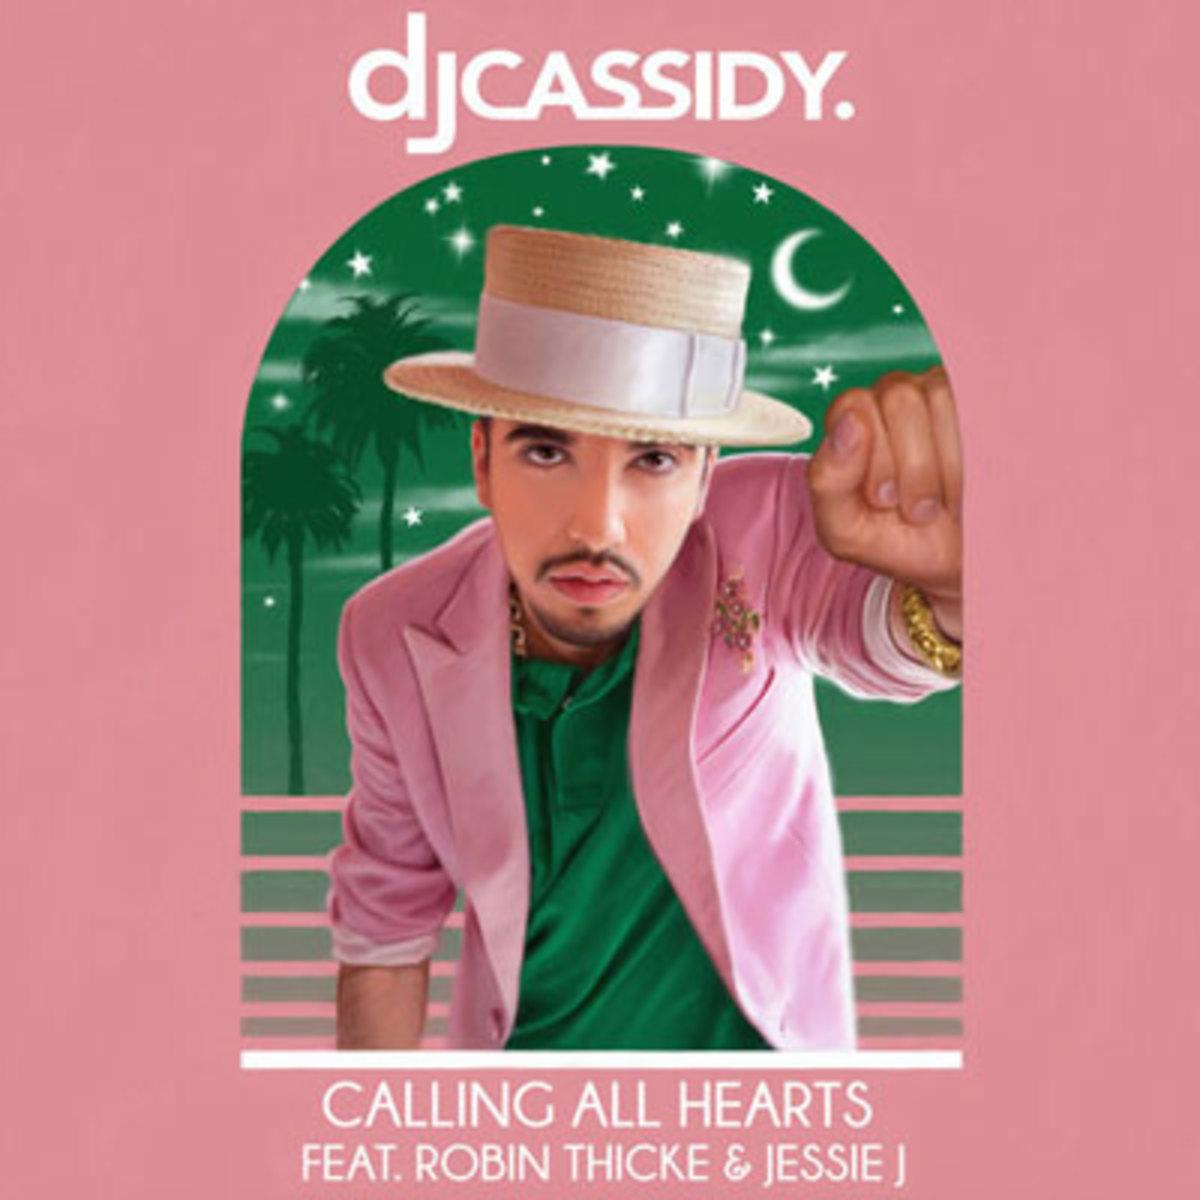 djcassidy-callingallhearts.jpg